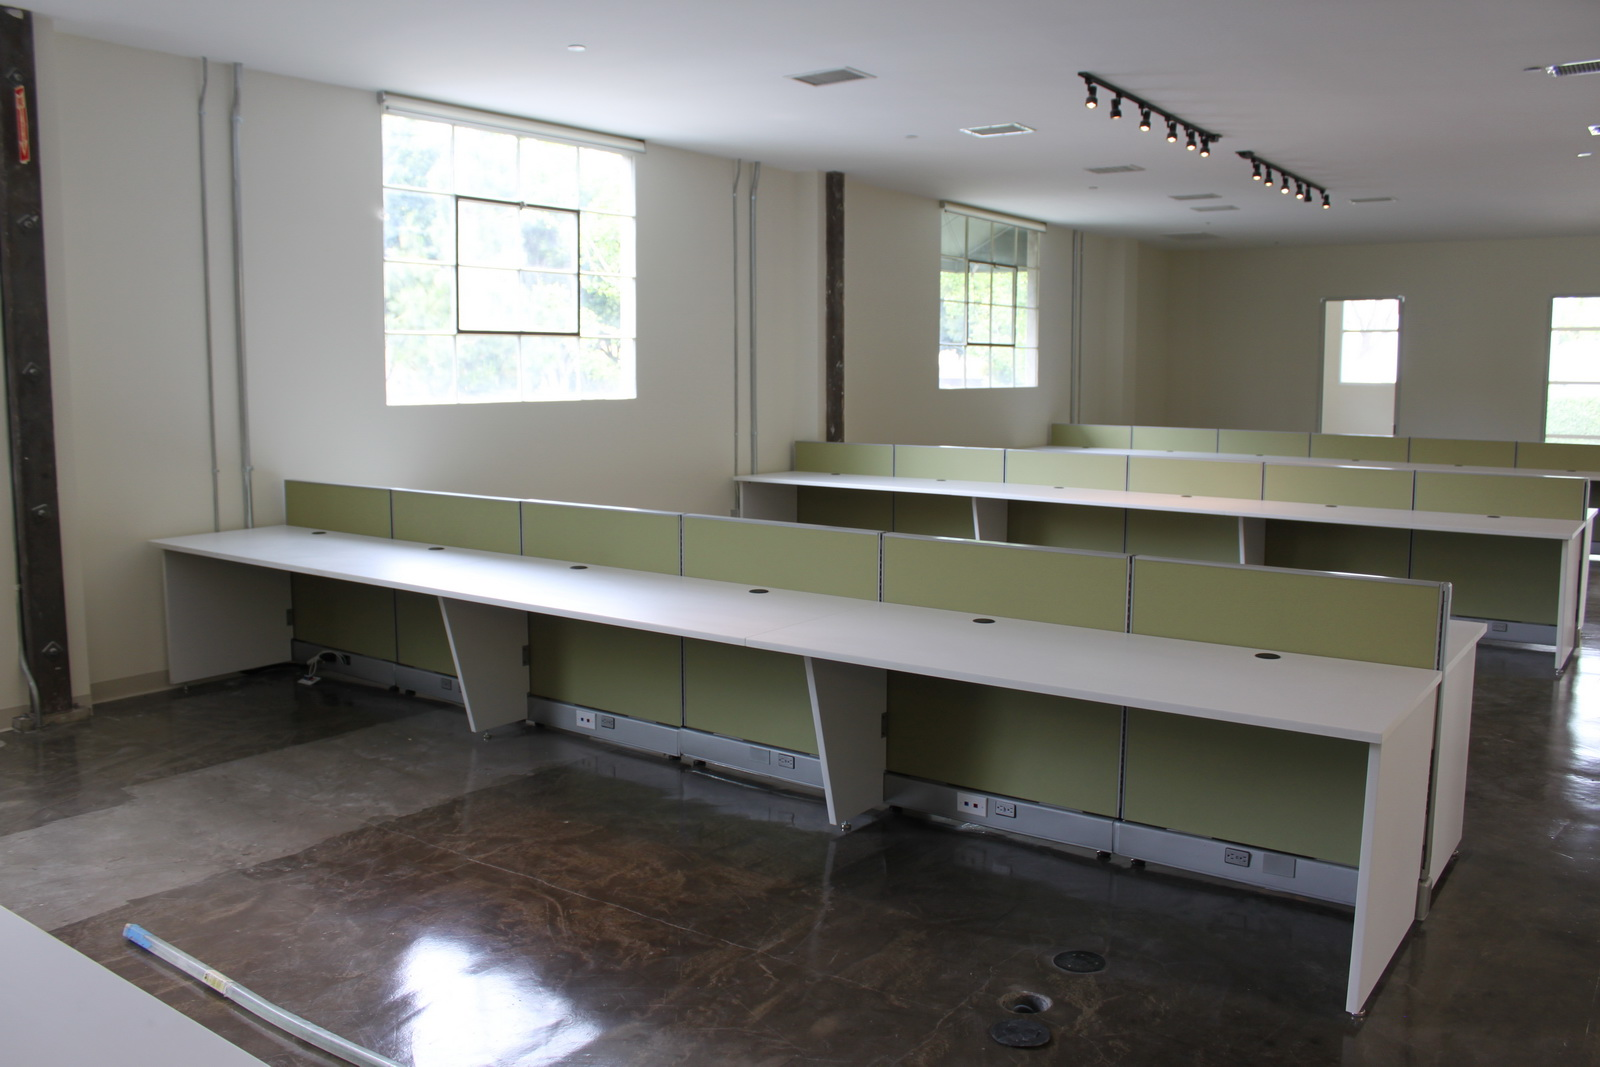 NBI Services | Office Space Planning & Design in Orange